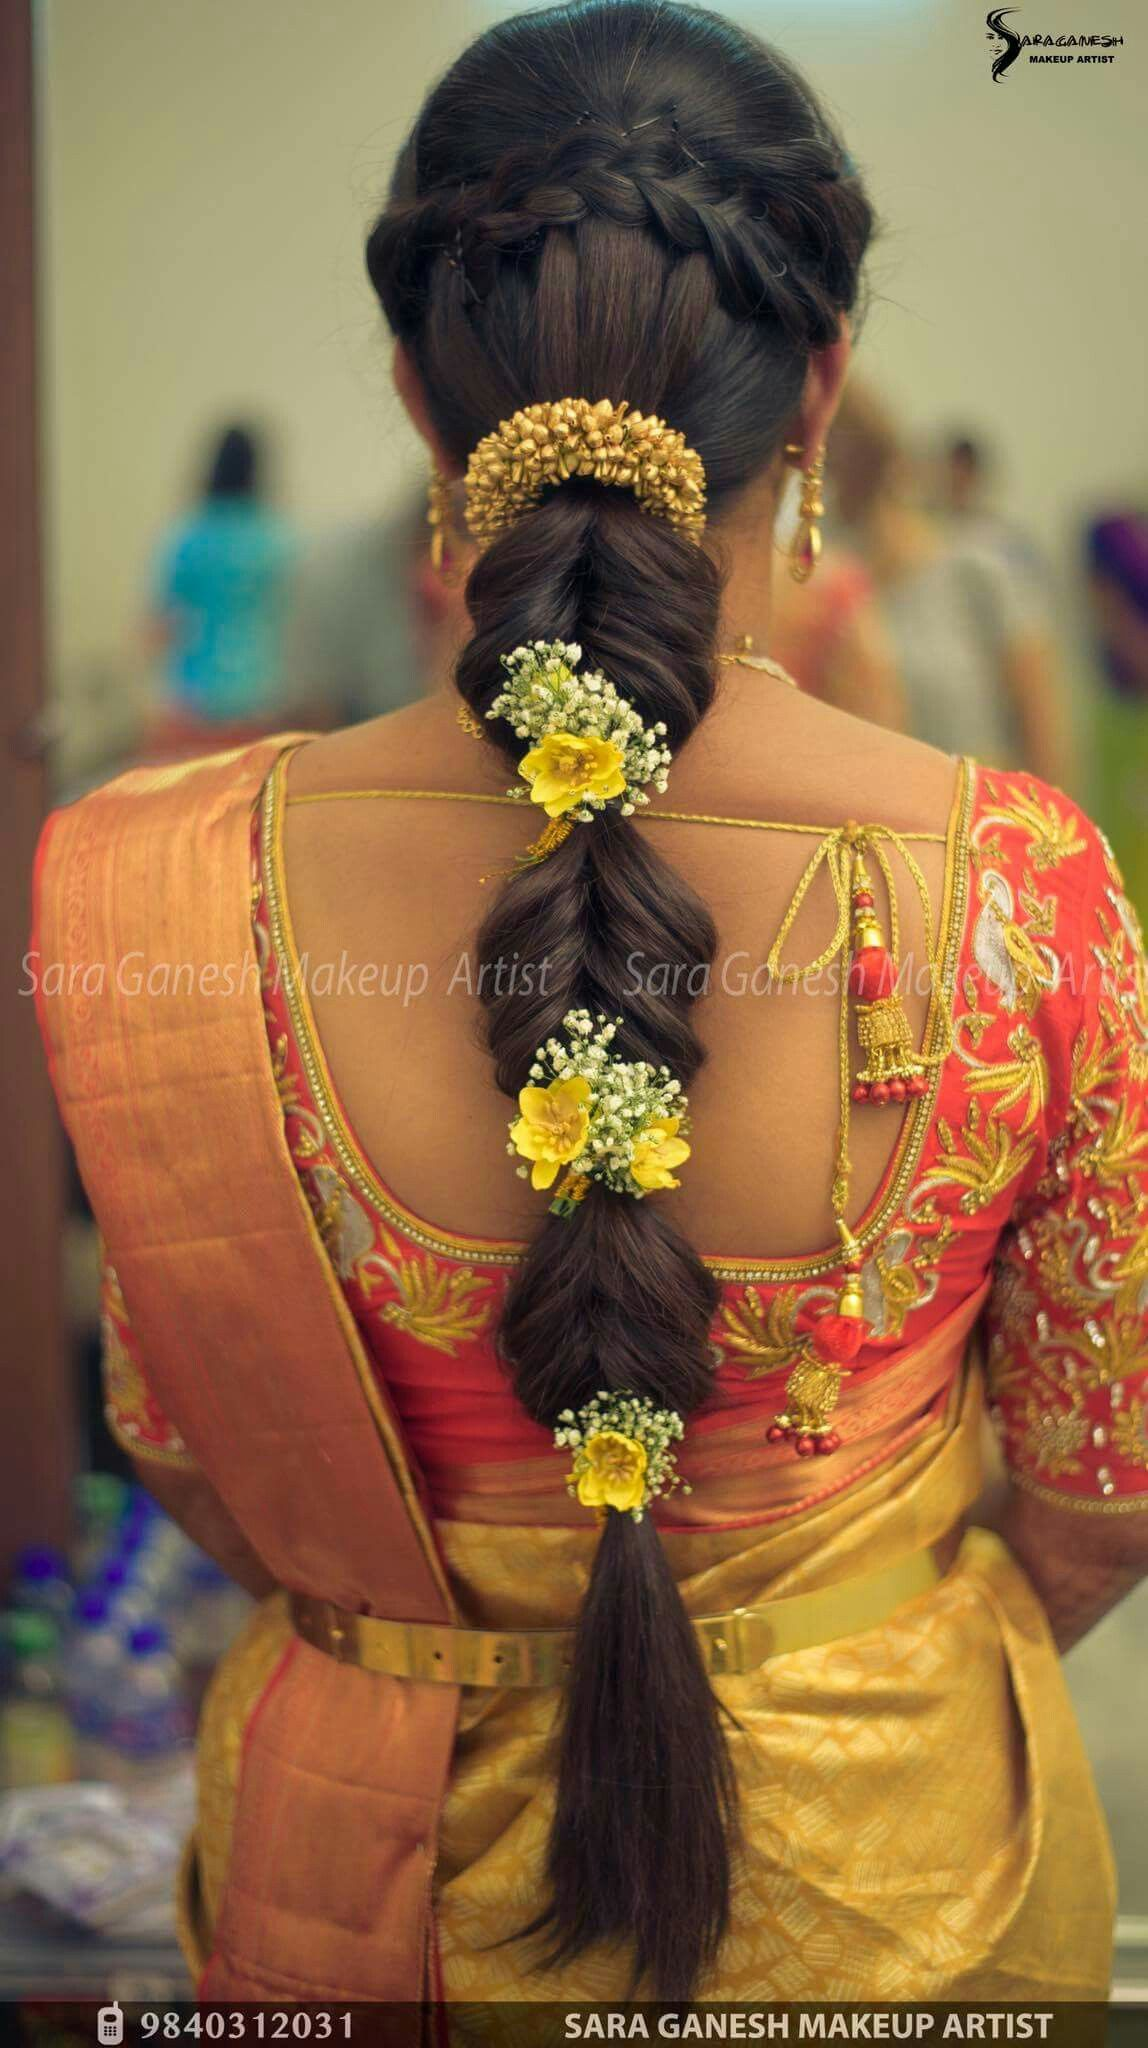 Hairstyle Bridal Hairstyle Indian Wedding Indian Bridal